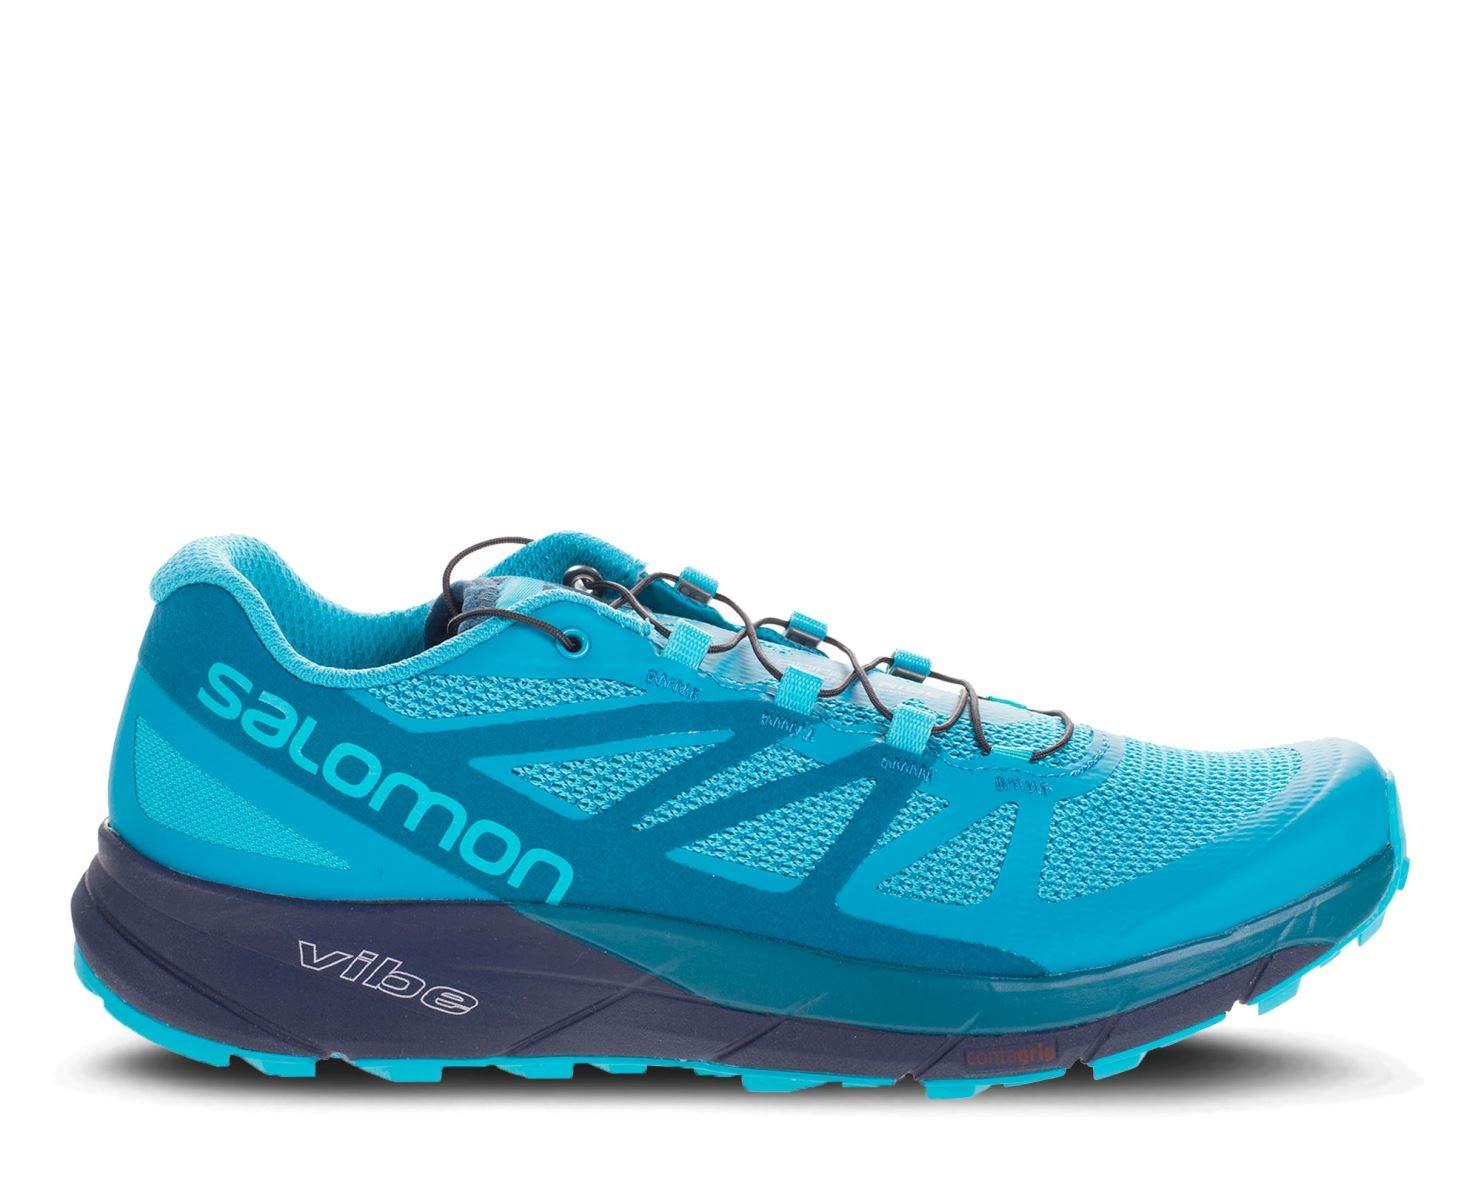 Salomon Sense Ride Running Shoe - Women's Blue Bird/Deep Lagoon/Navy Blazer 7 by Salomon (Image #6)